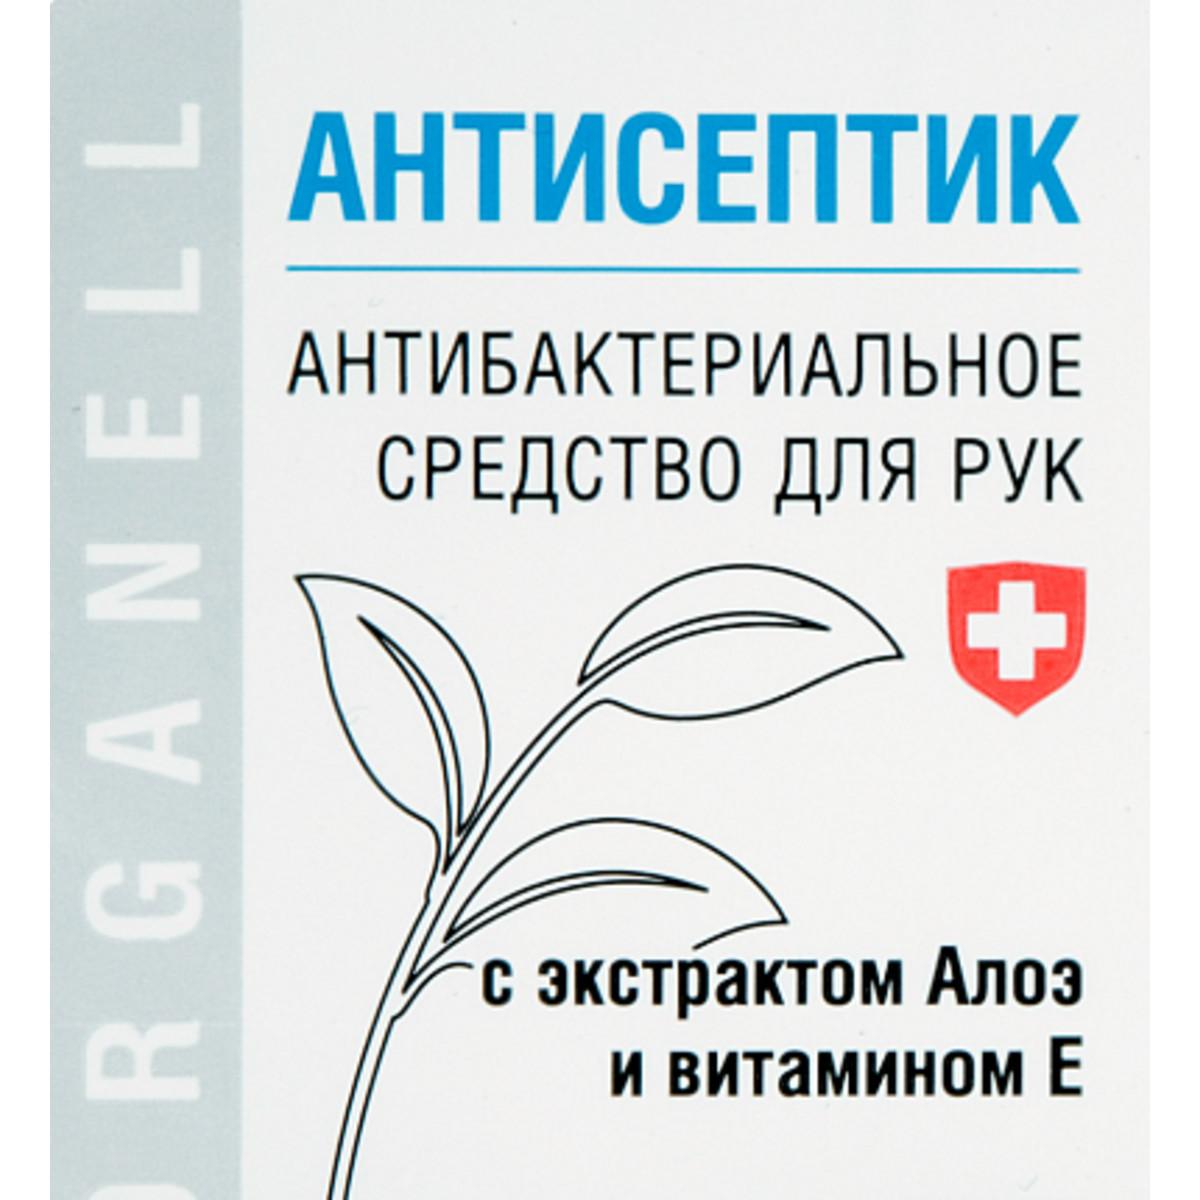 Антибактериальное средство для рук ORGANELL 500 мл